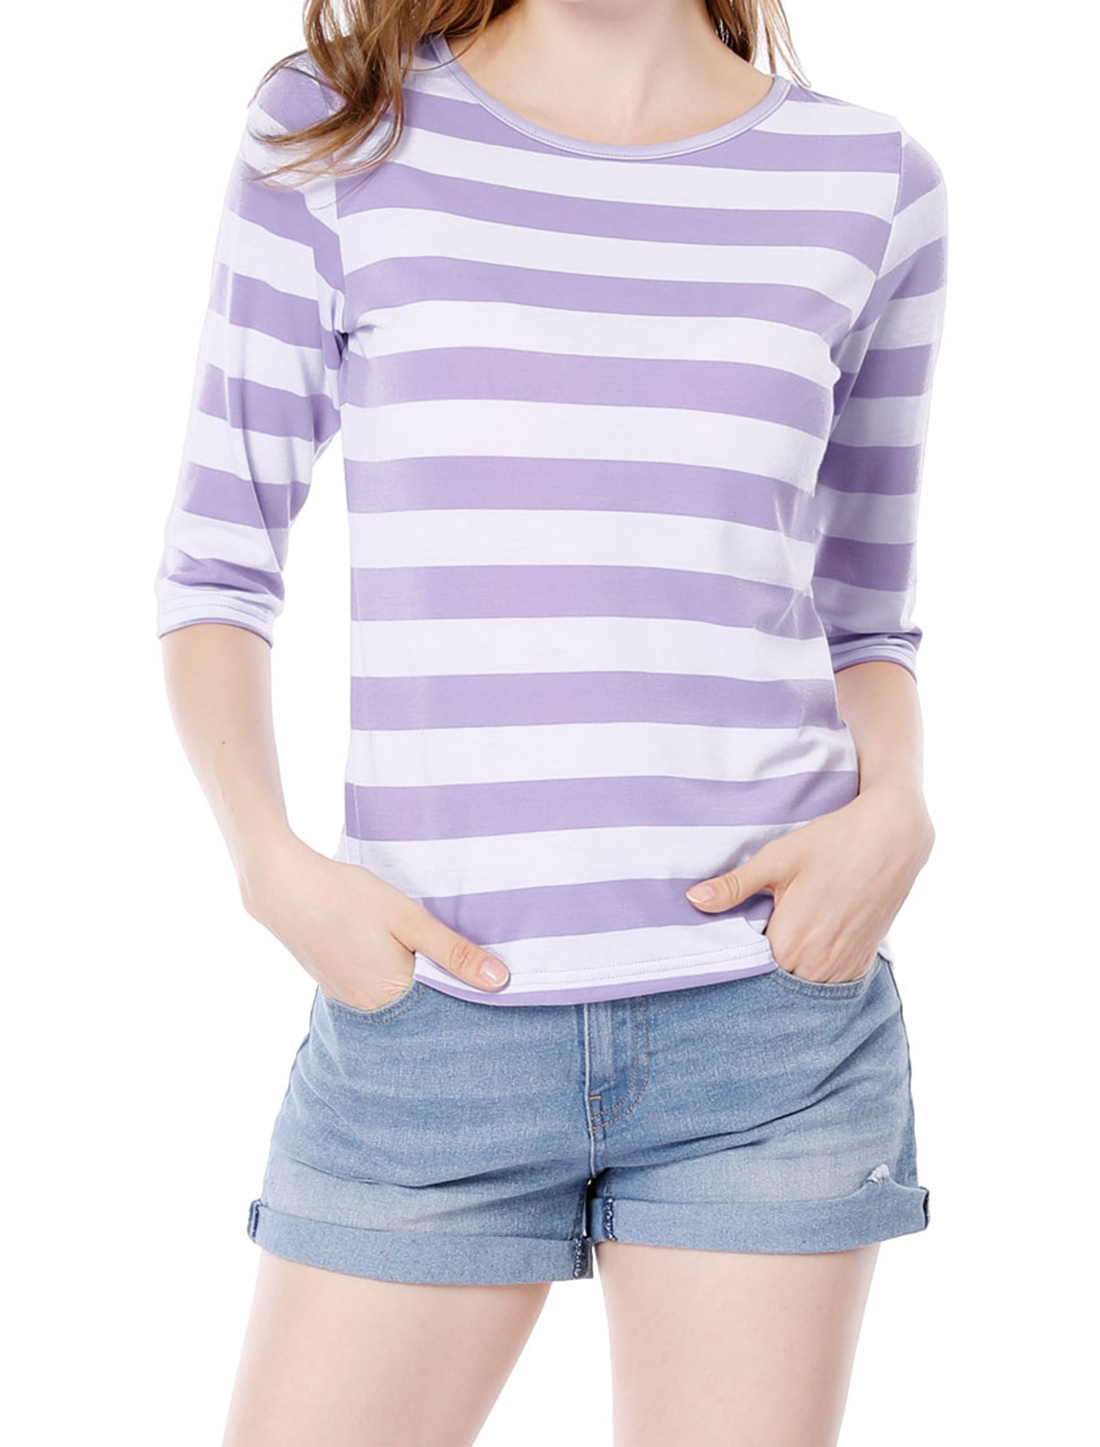 Allegra K Women Elbow Sleeve Contrast Color Printed Tee Light Purple L